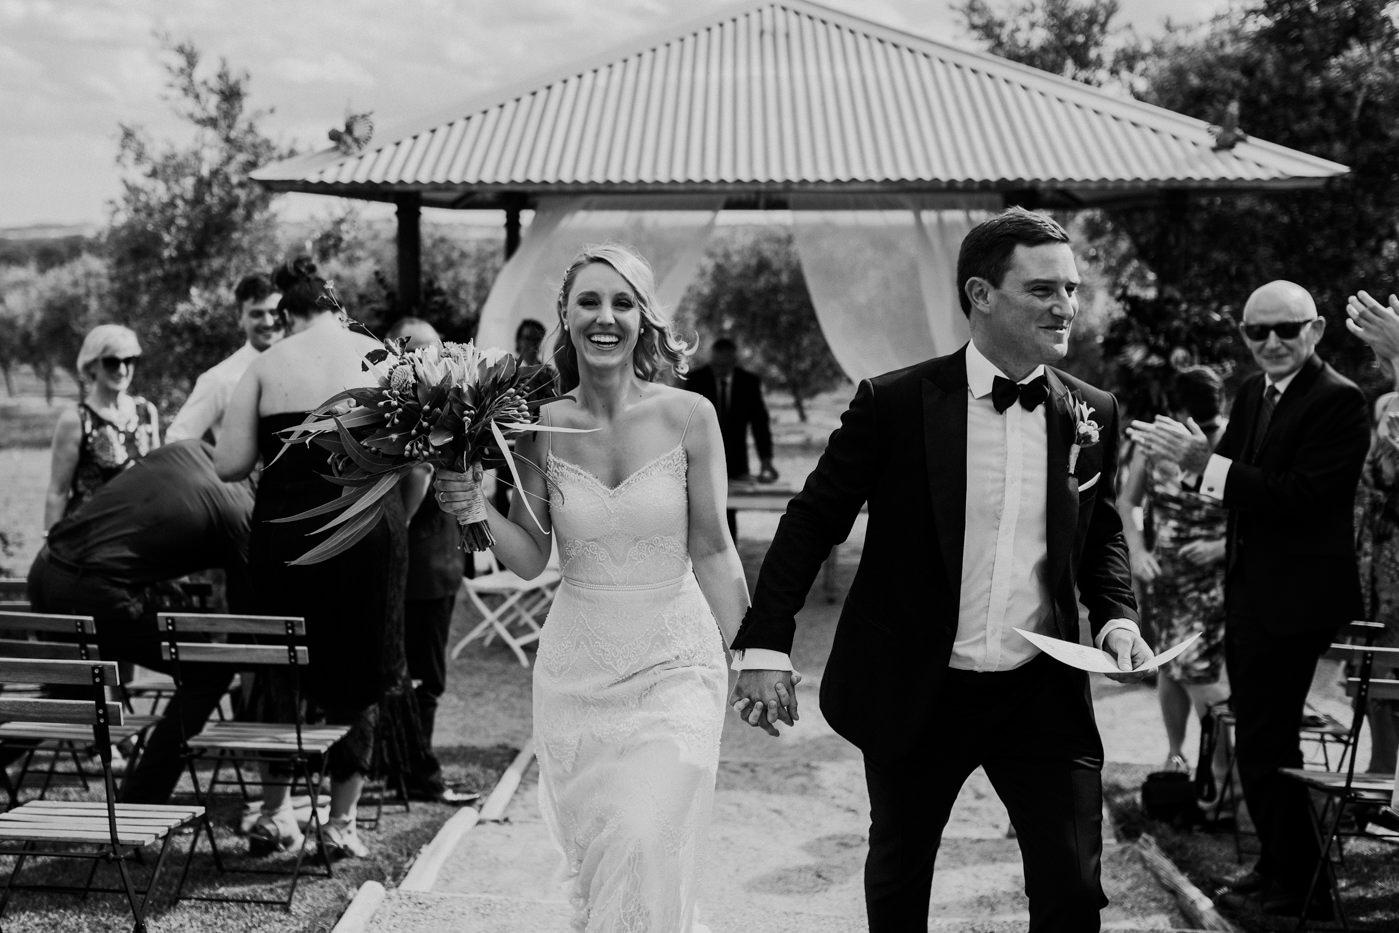 Anthony & Eliet - Wagga Wagga Wedding - Country NSW - Samantha Heather Photography-111.jpg